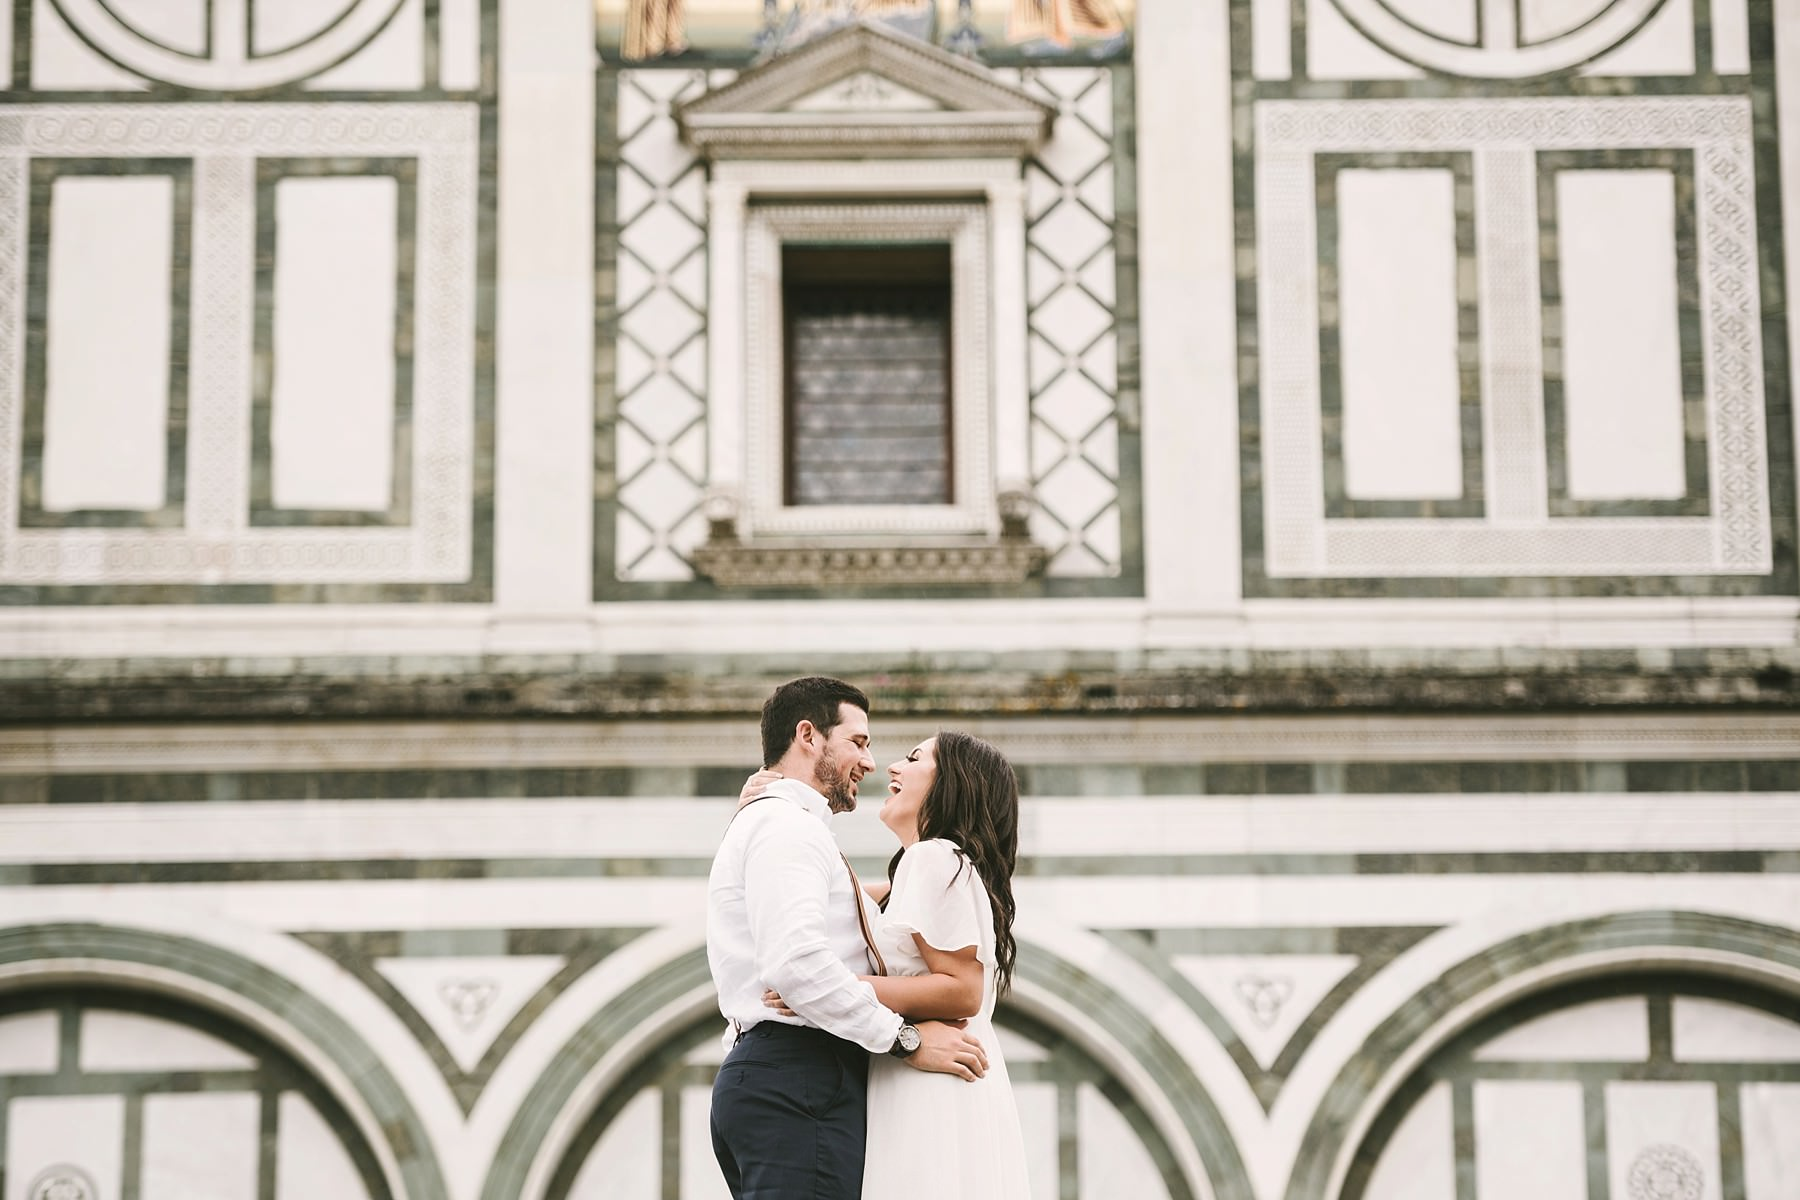 Elegant and romantic couple portrait photo shoot all around Florence the cradle of Renaissance